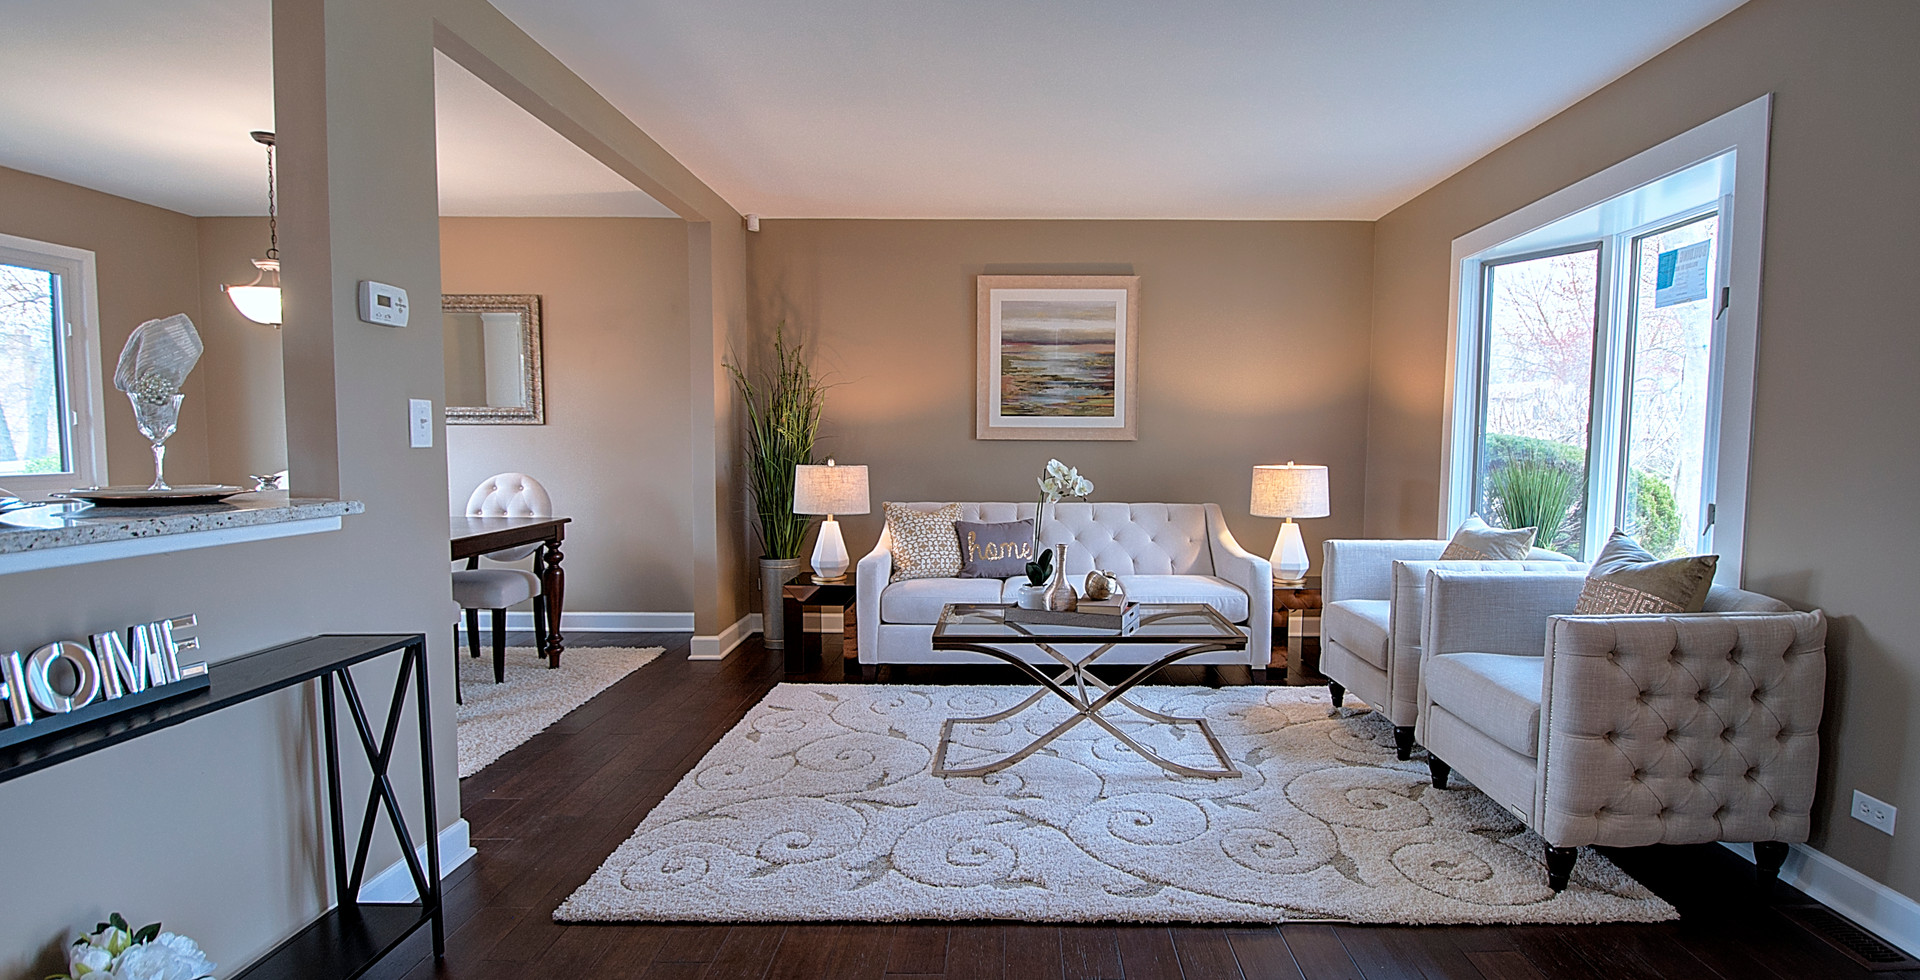 Living Room in Forest Park designed by MRM Home Design.jpg